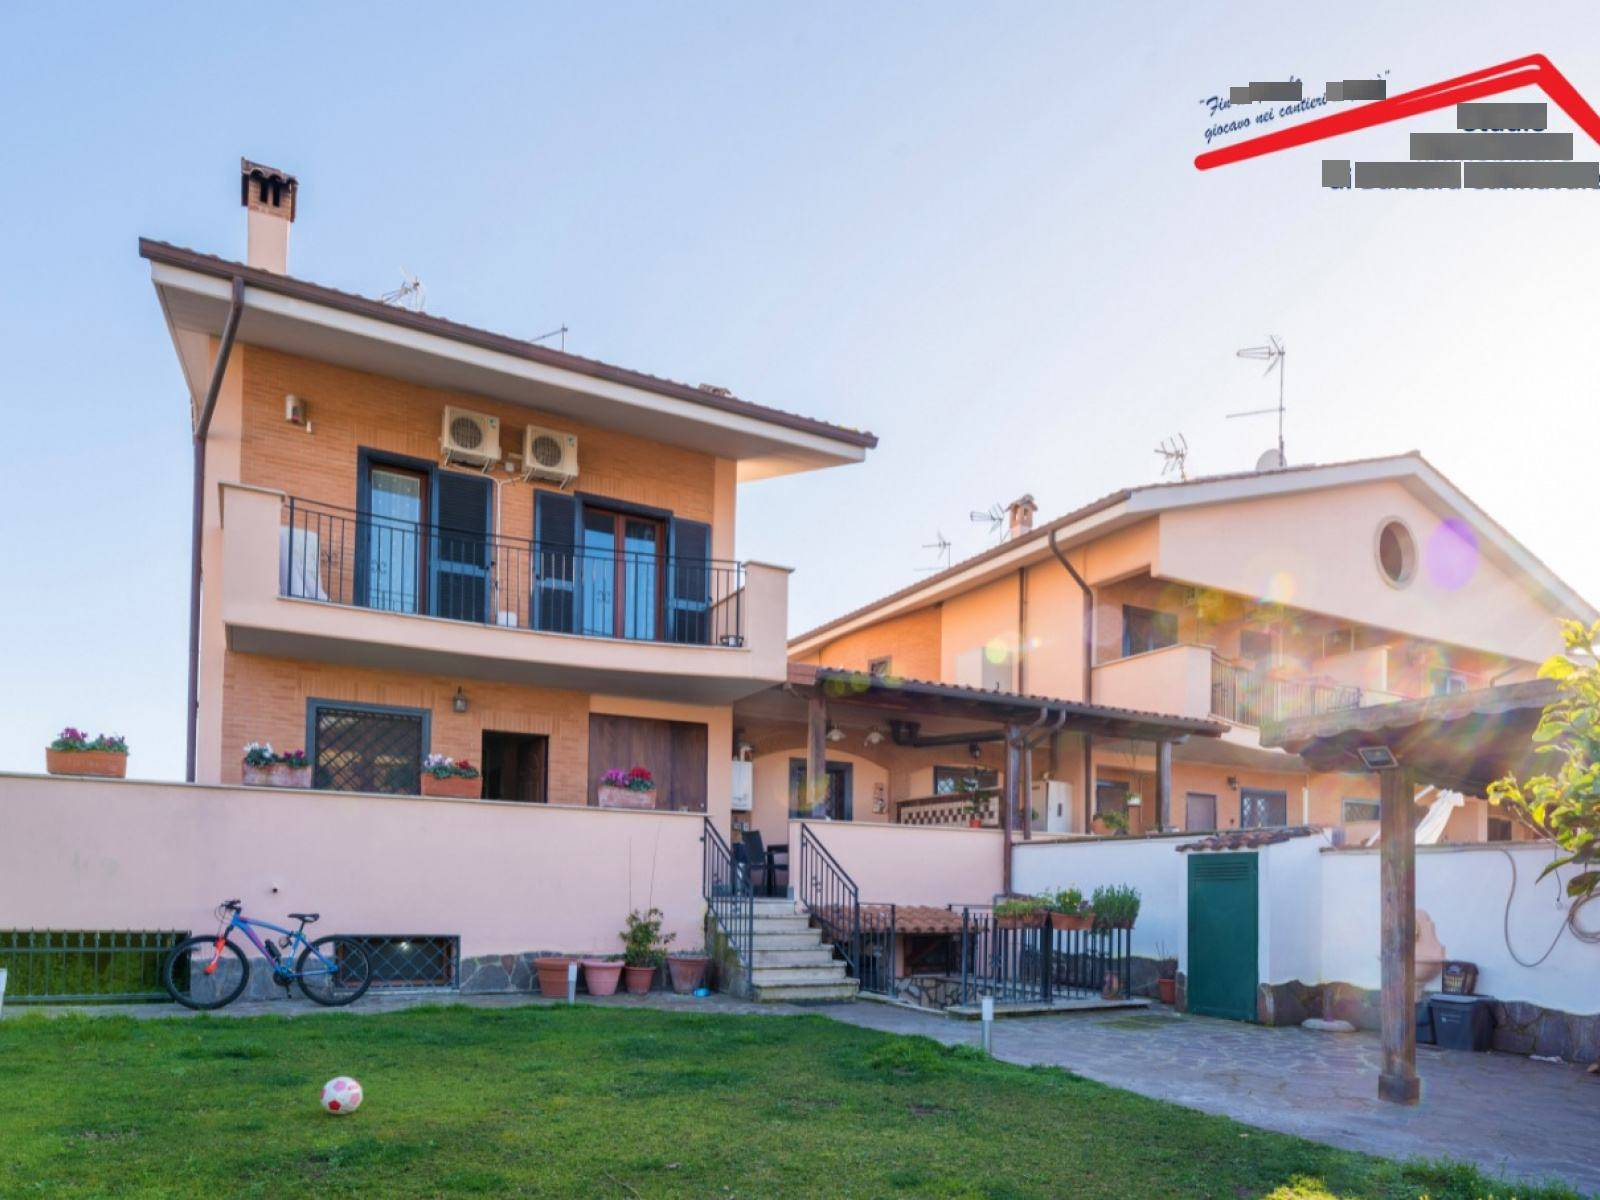 1118421004 Plurilocale (6) in Via Santa Cristina Val Gardena, Roma, Zona Infernetto